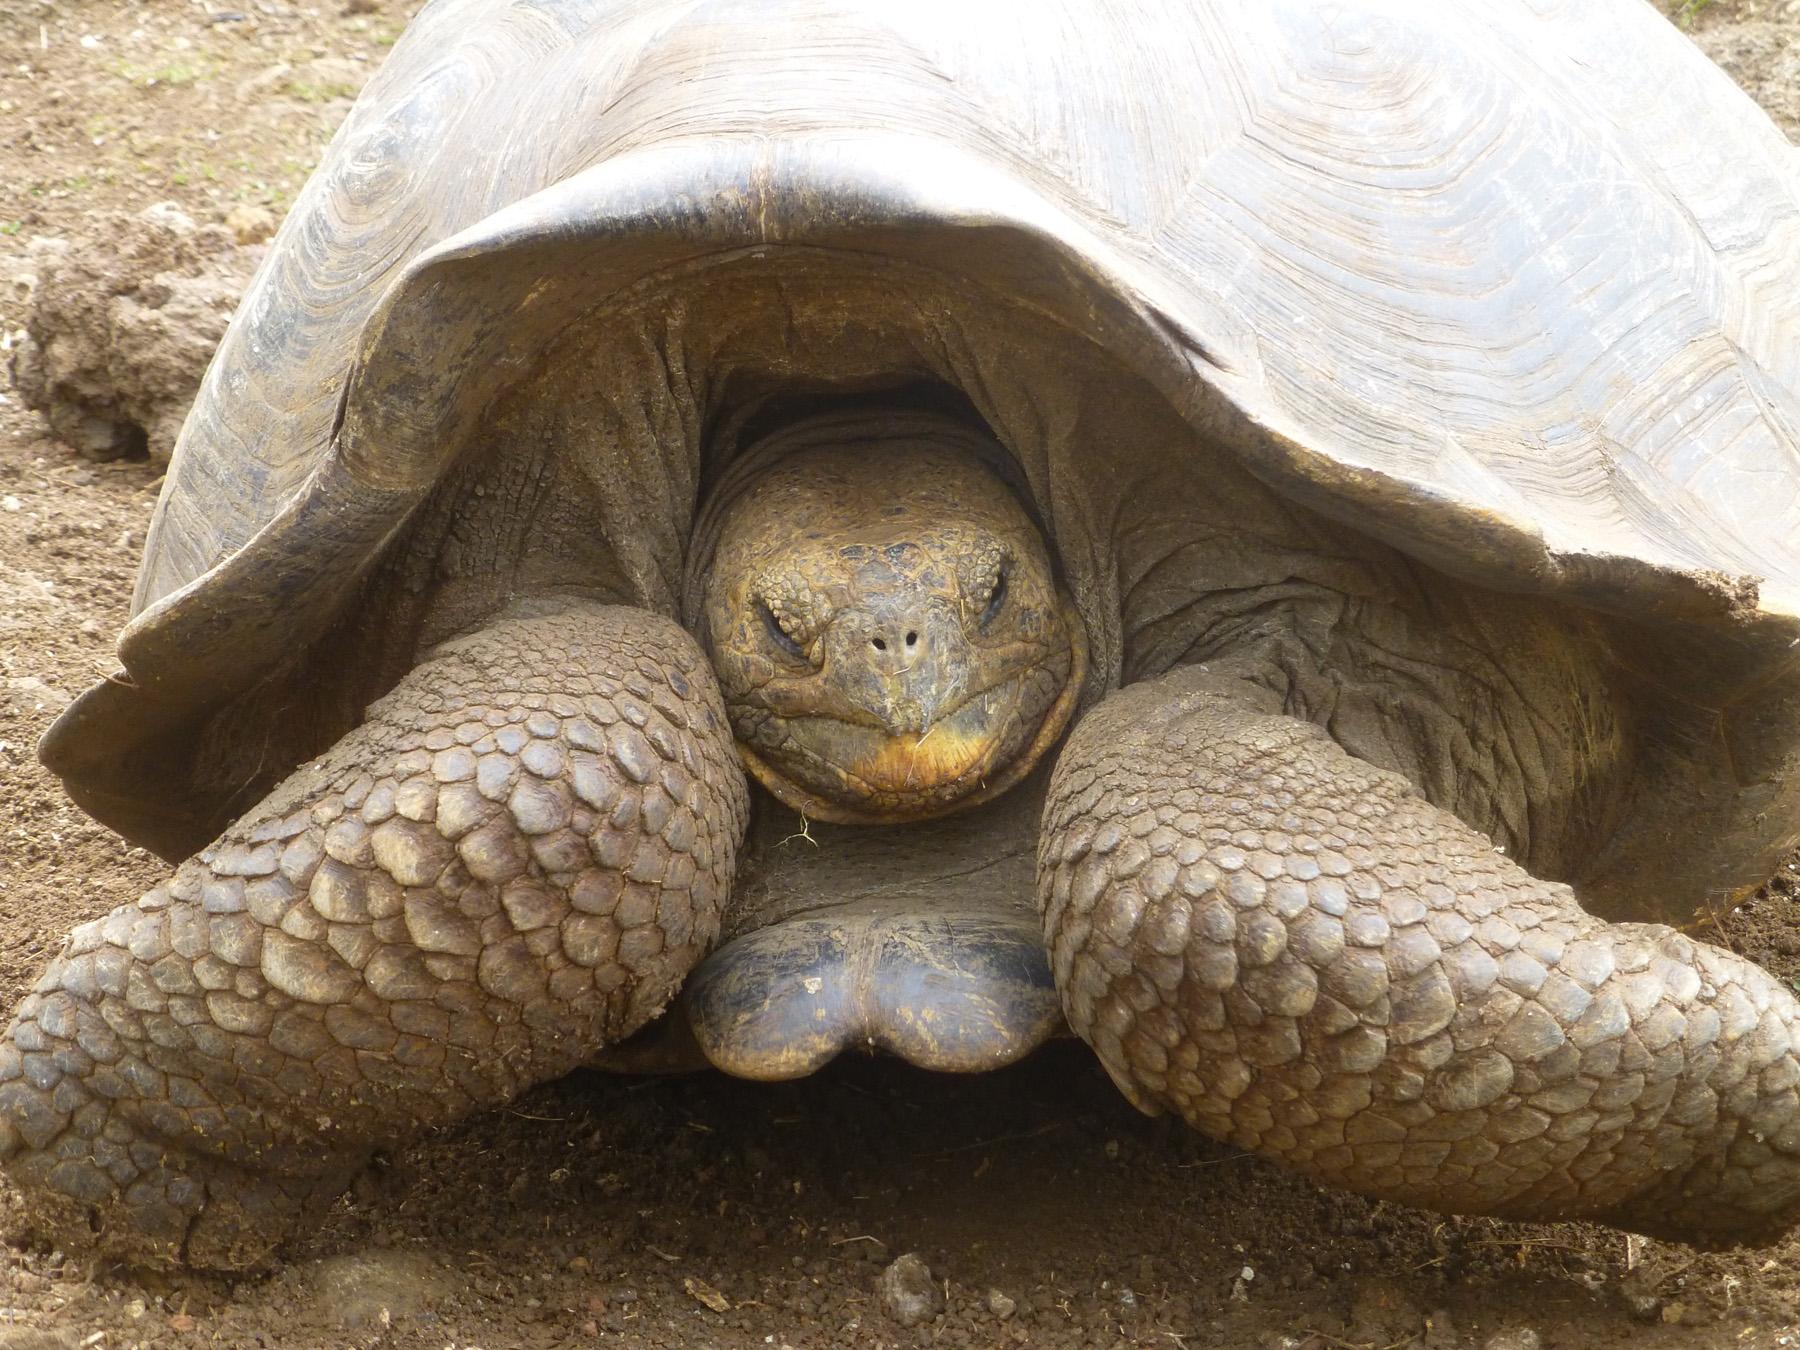 A giant tortoise at the tortoise sanctuary.